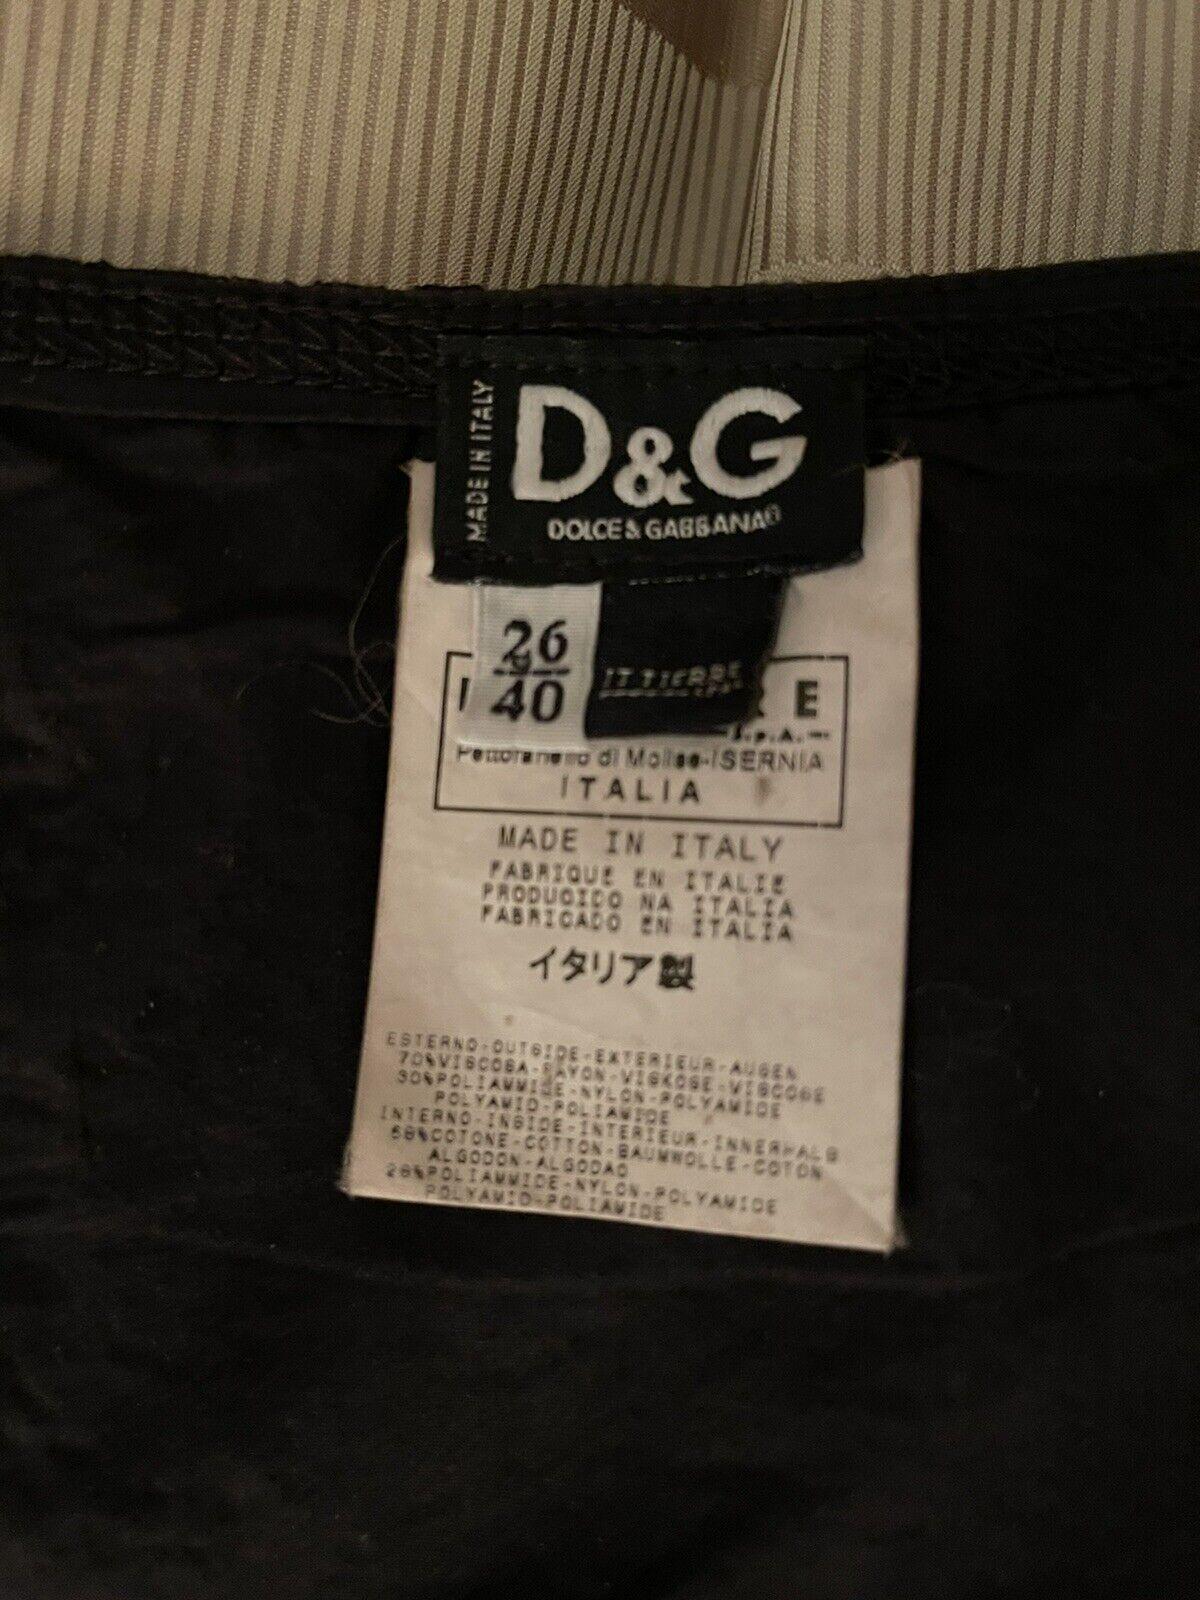 Dolce& Gabbana Black Lace Corset Top Size 26/40 - image 6